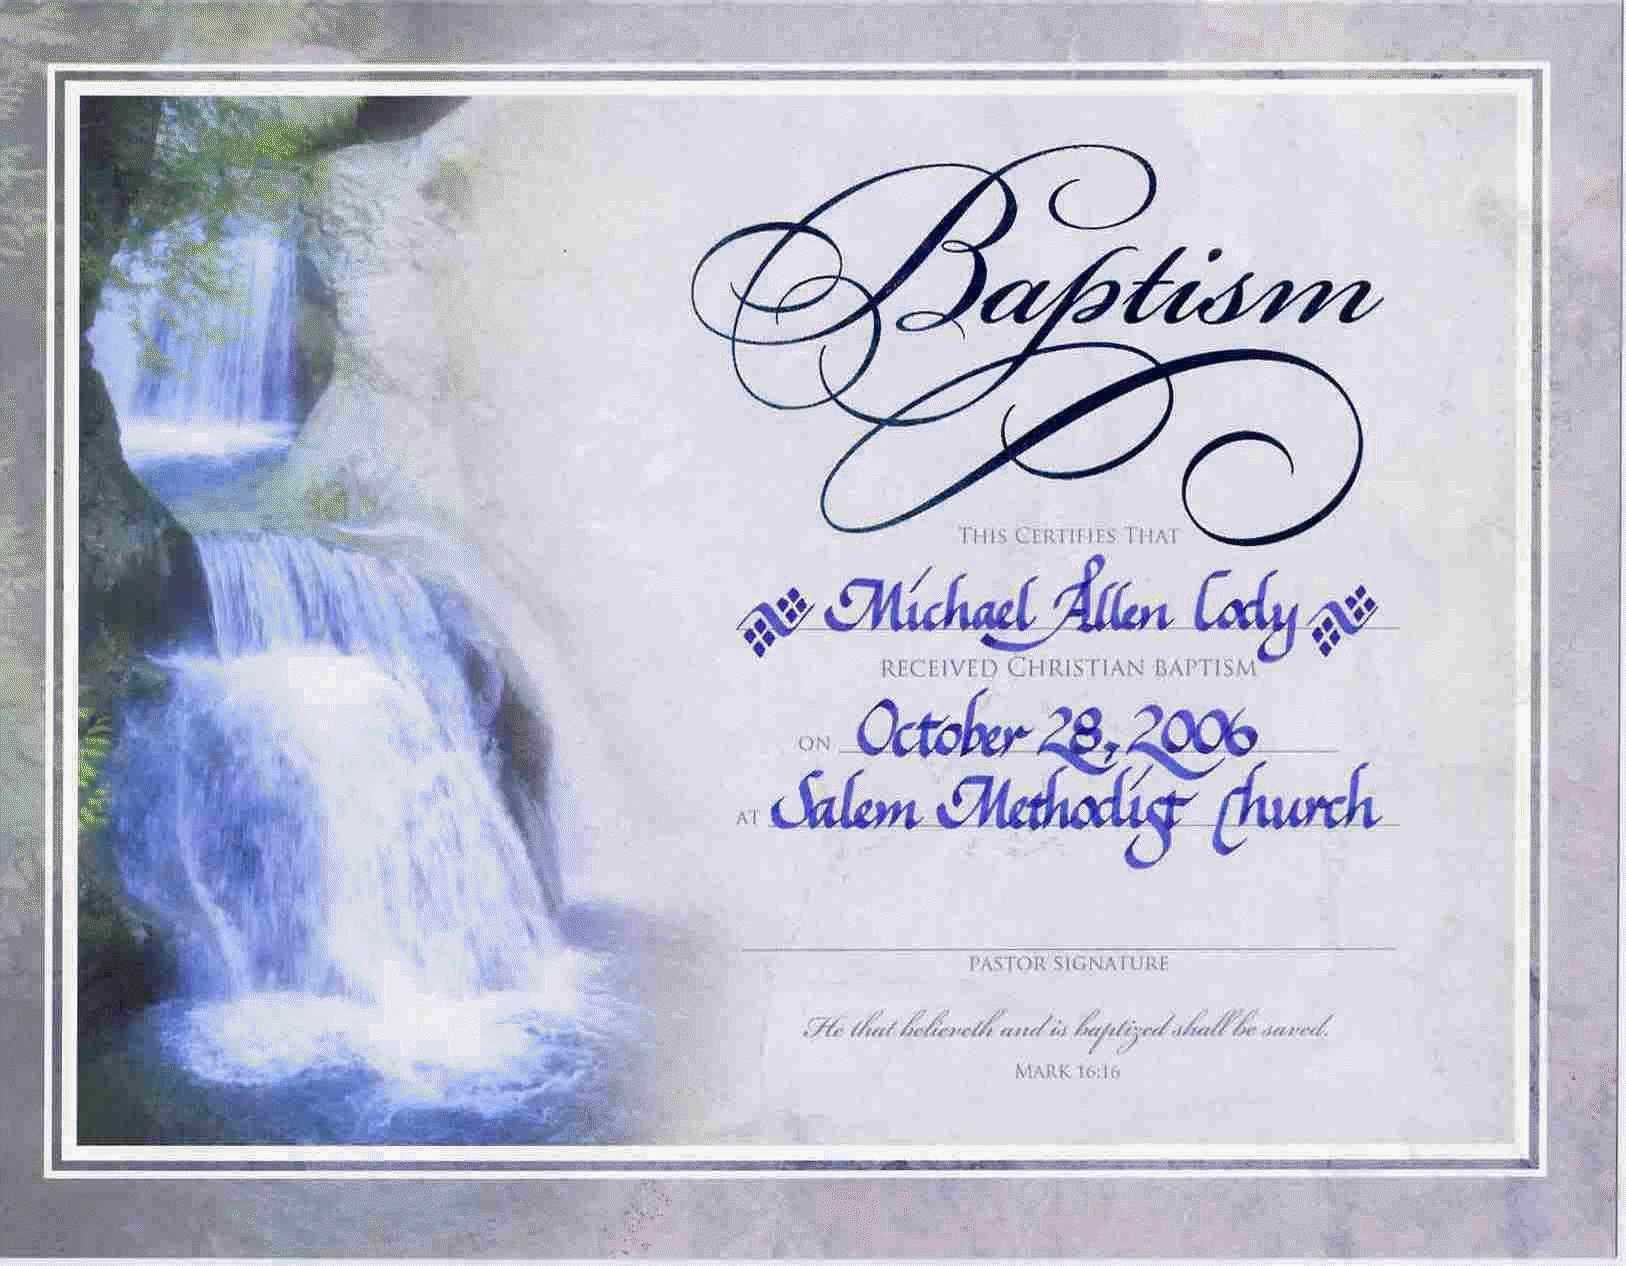 Water Baptism Certificate Templateencephaloscom With Christian Baptism Certificate Template